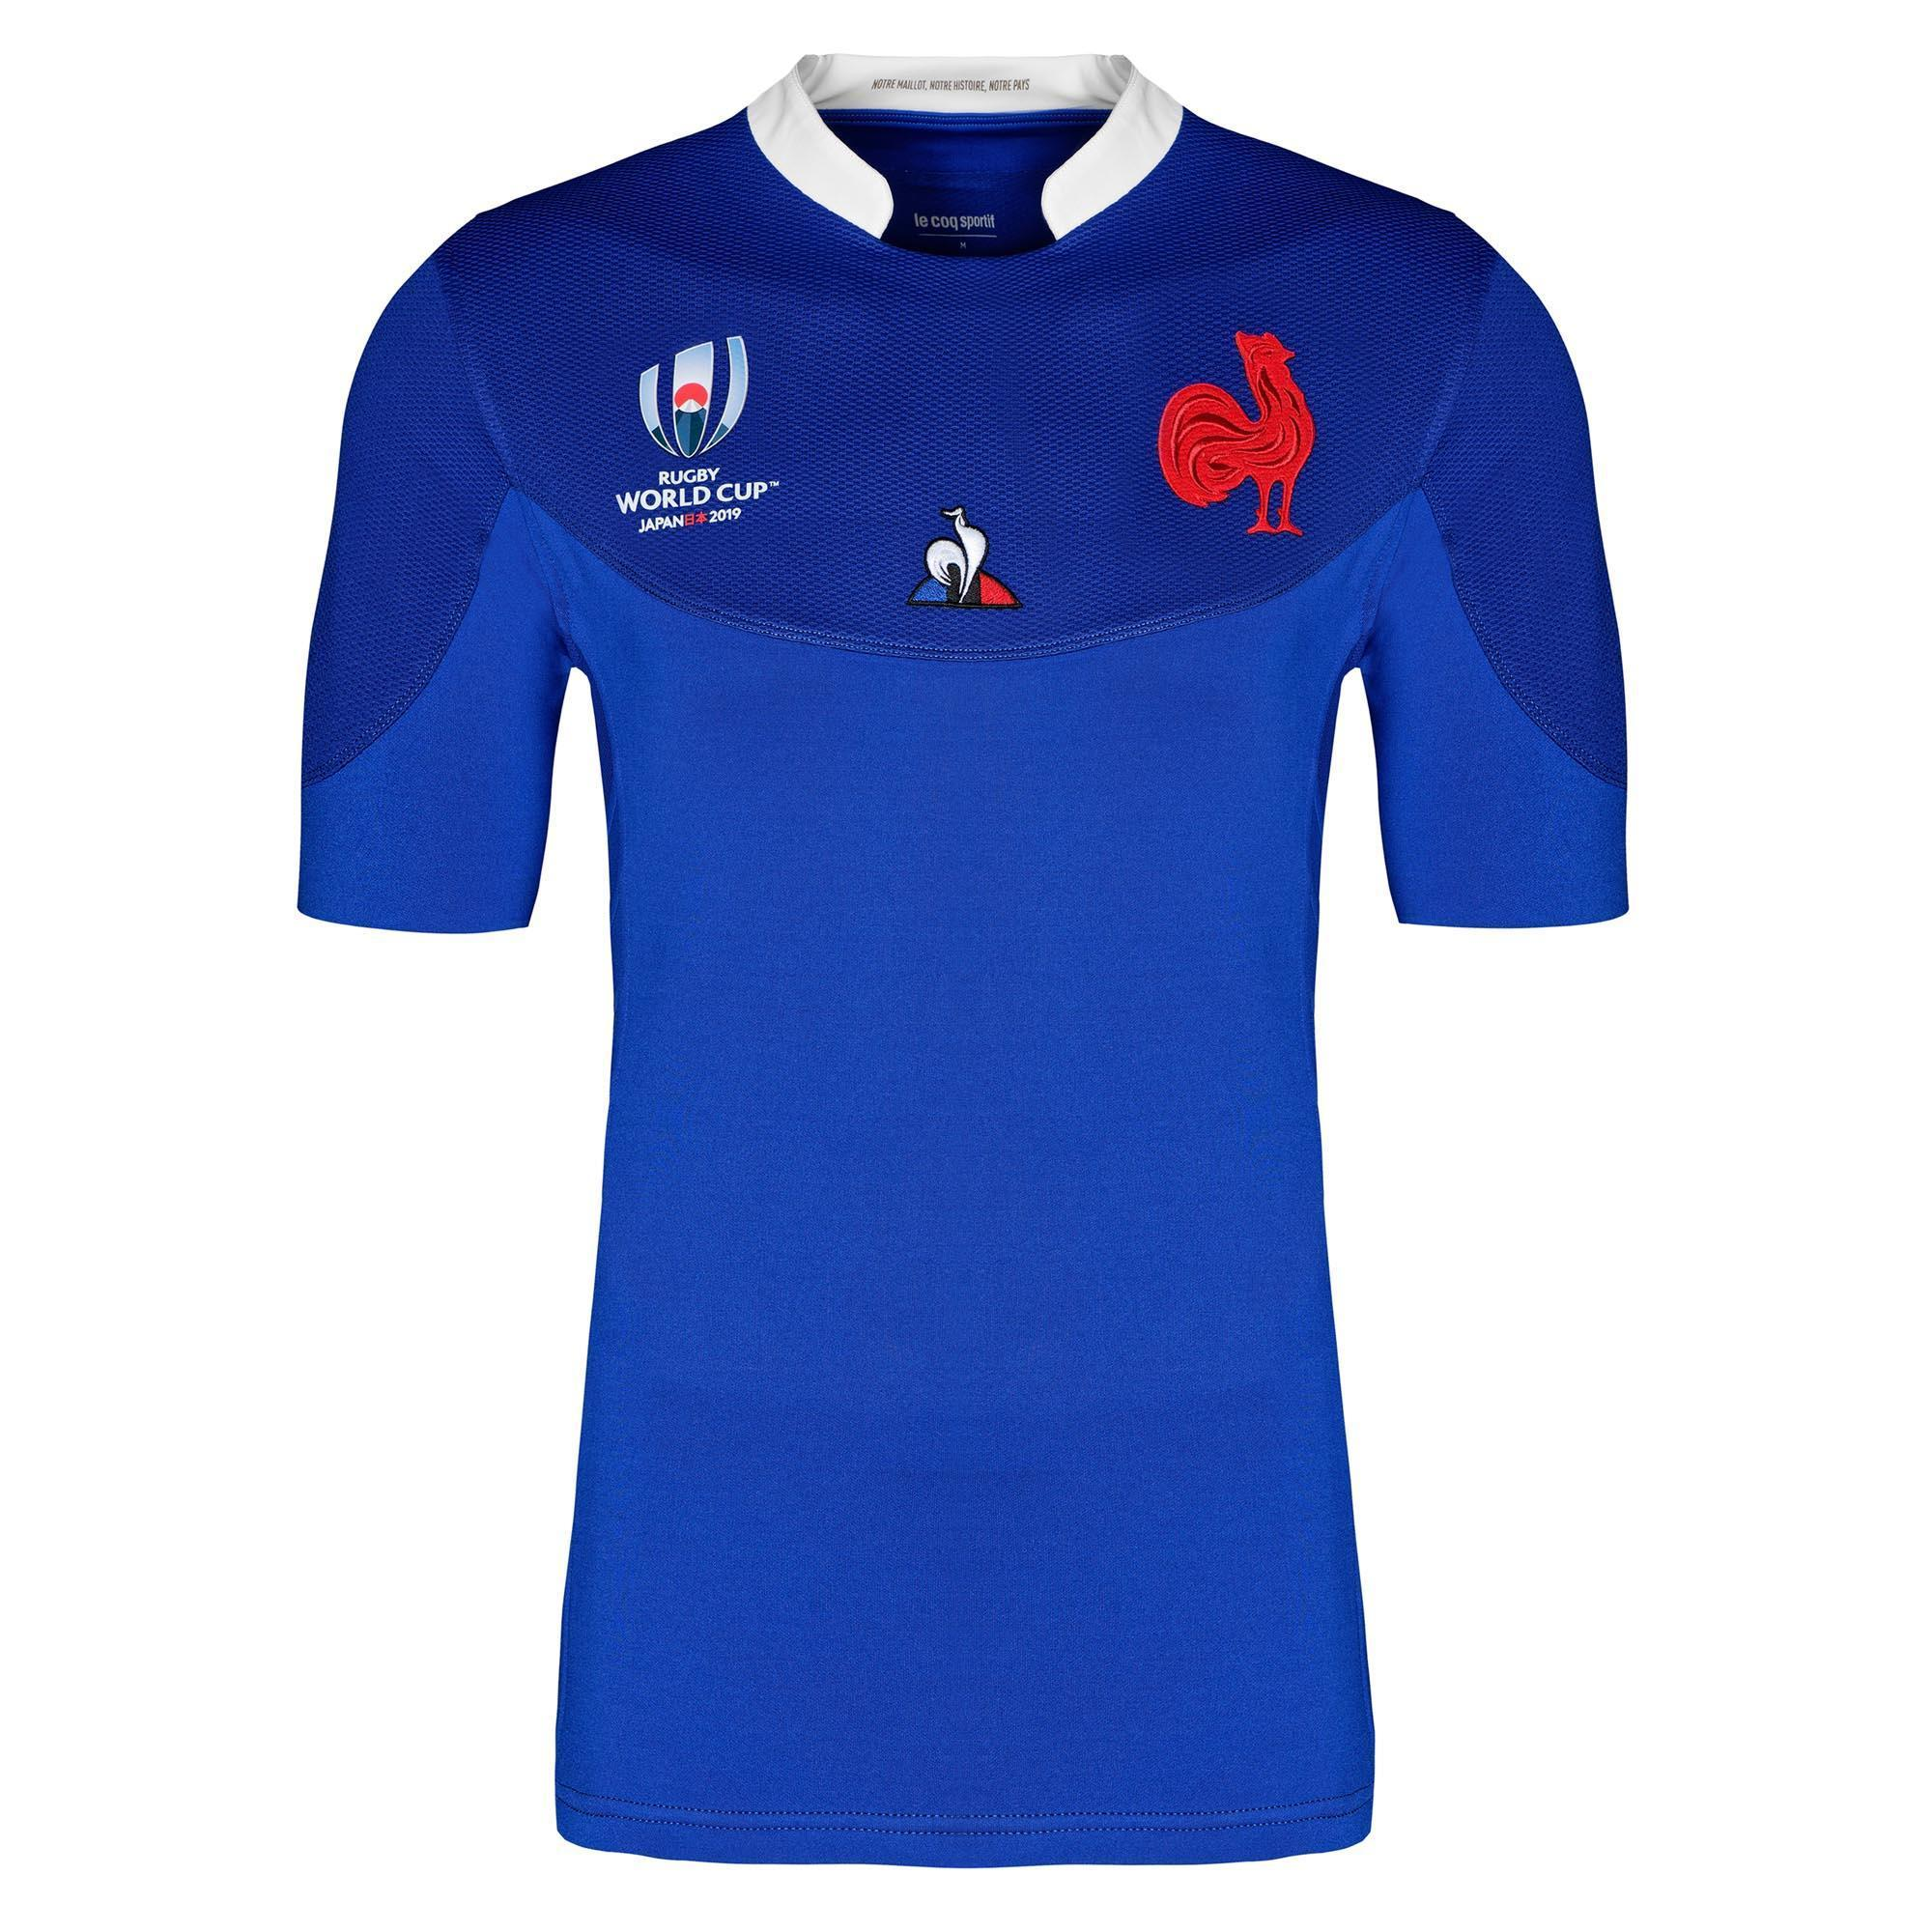 Maillot de rugby replica FFR XV de France